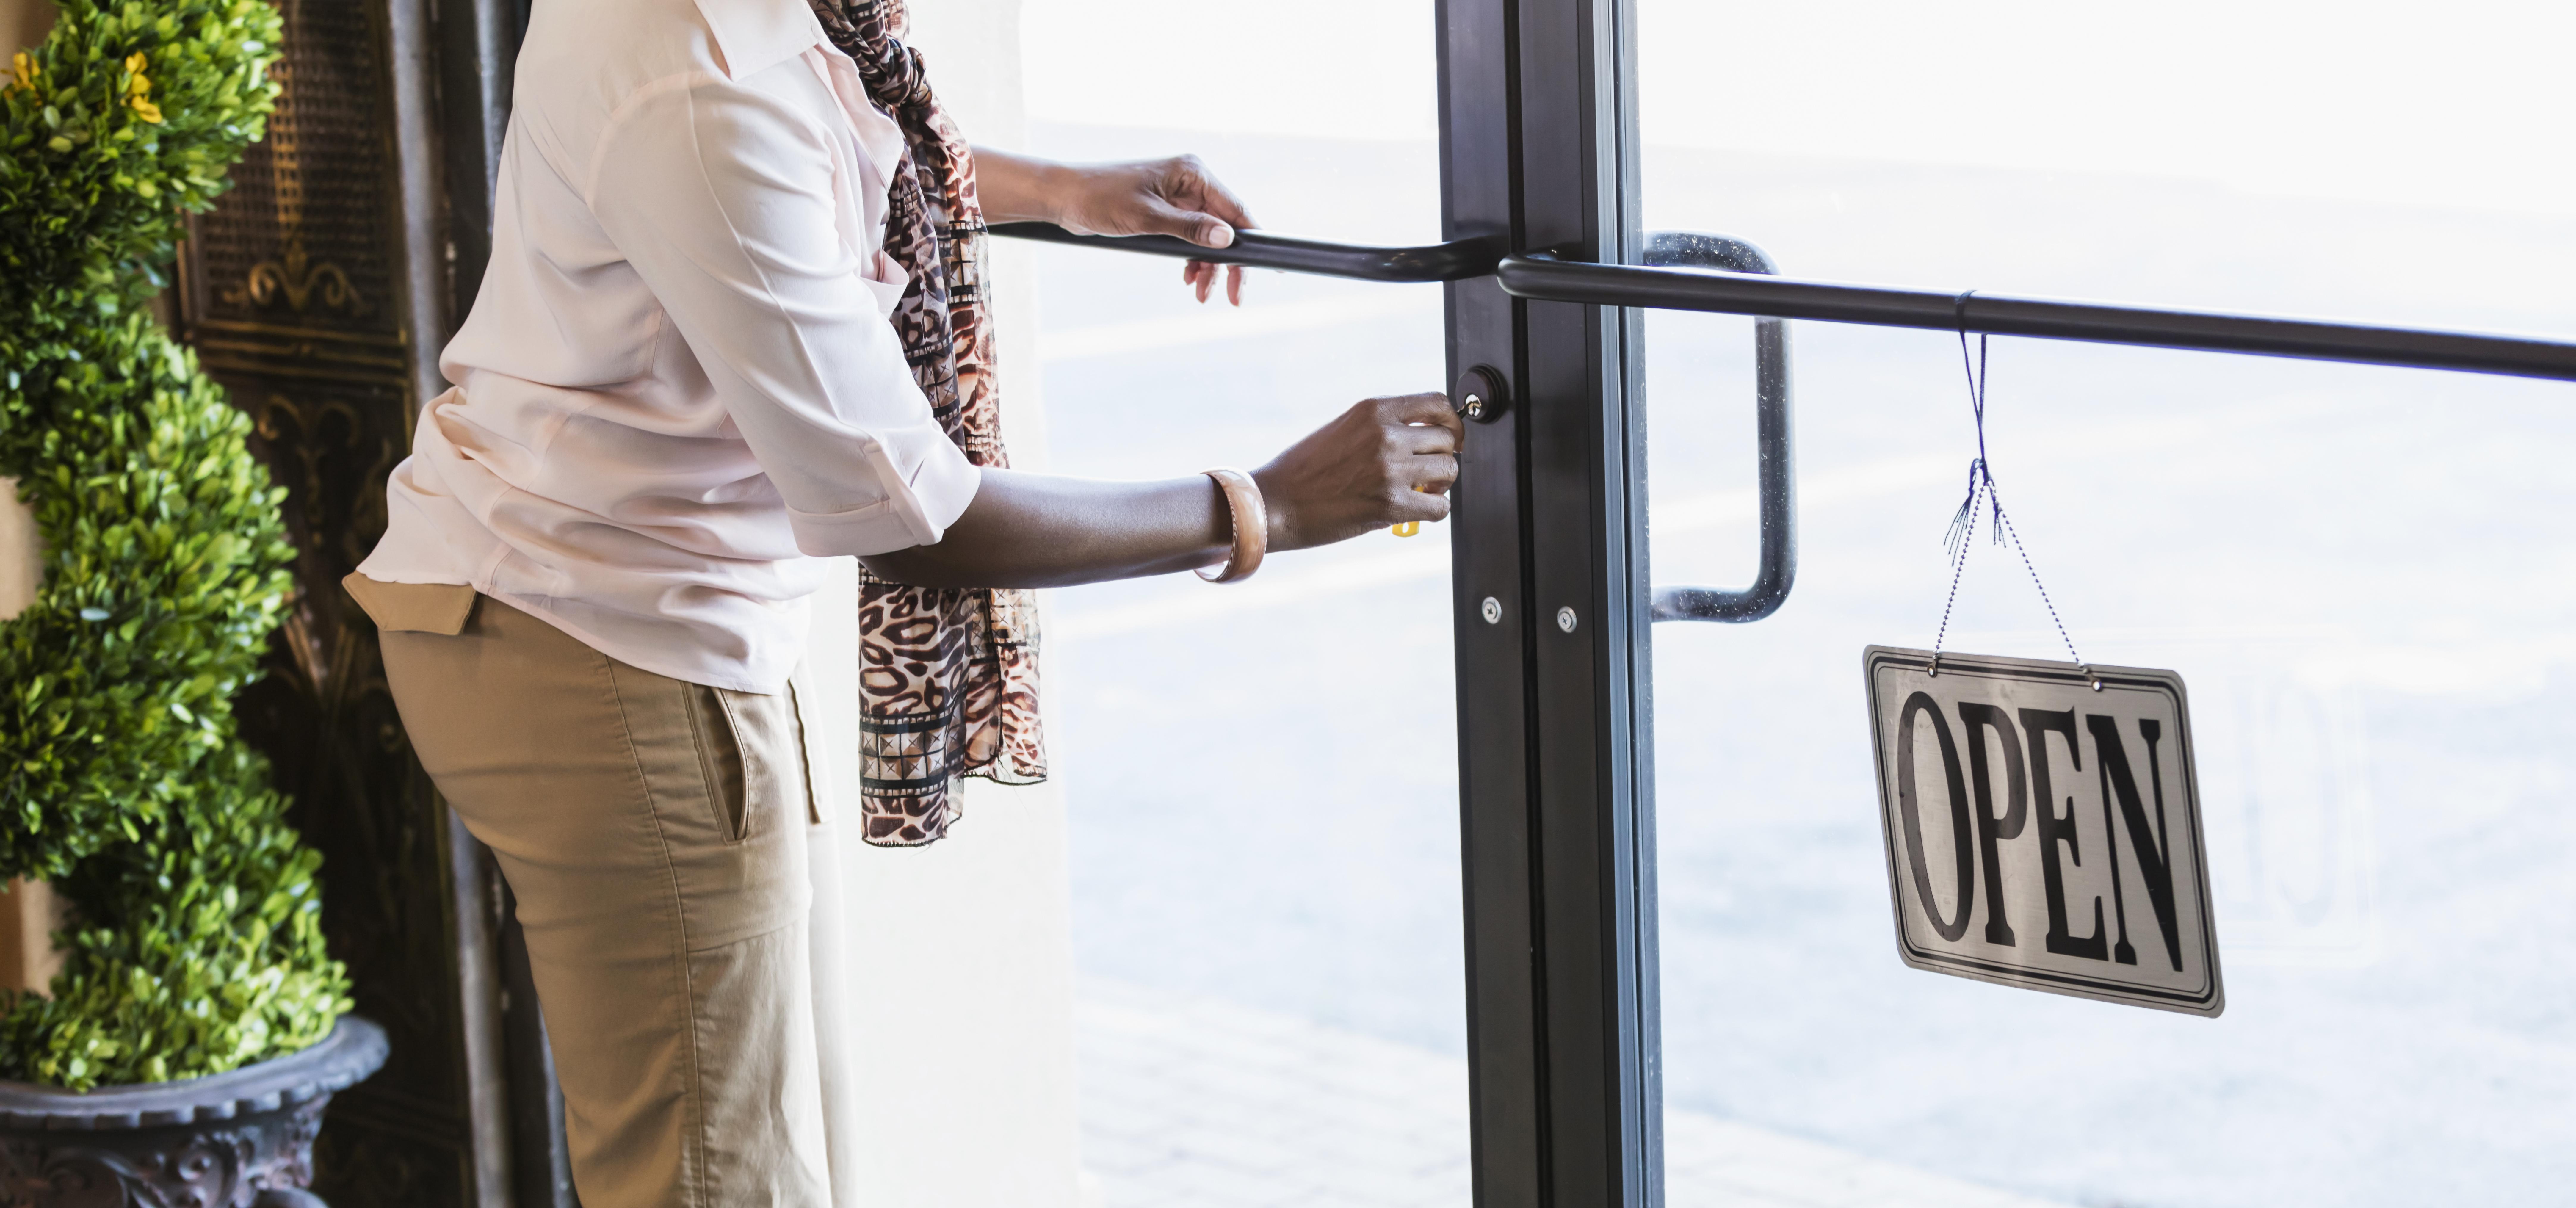 African-American woman opening store, unlocking the door